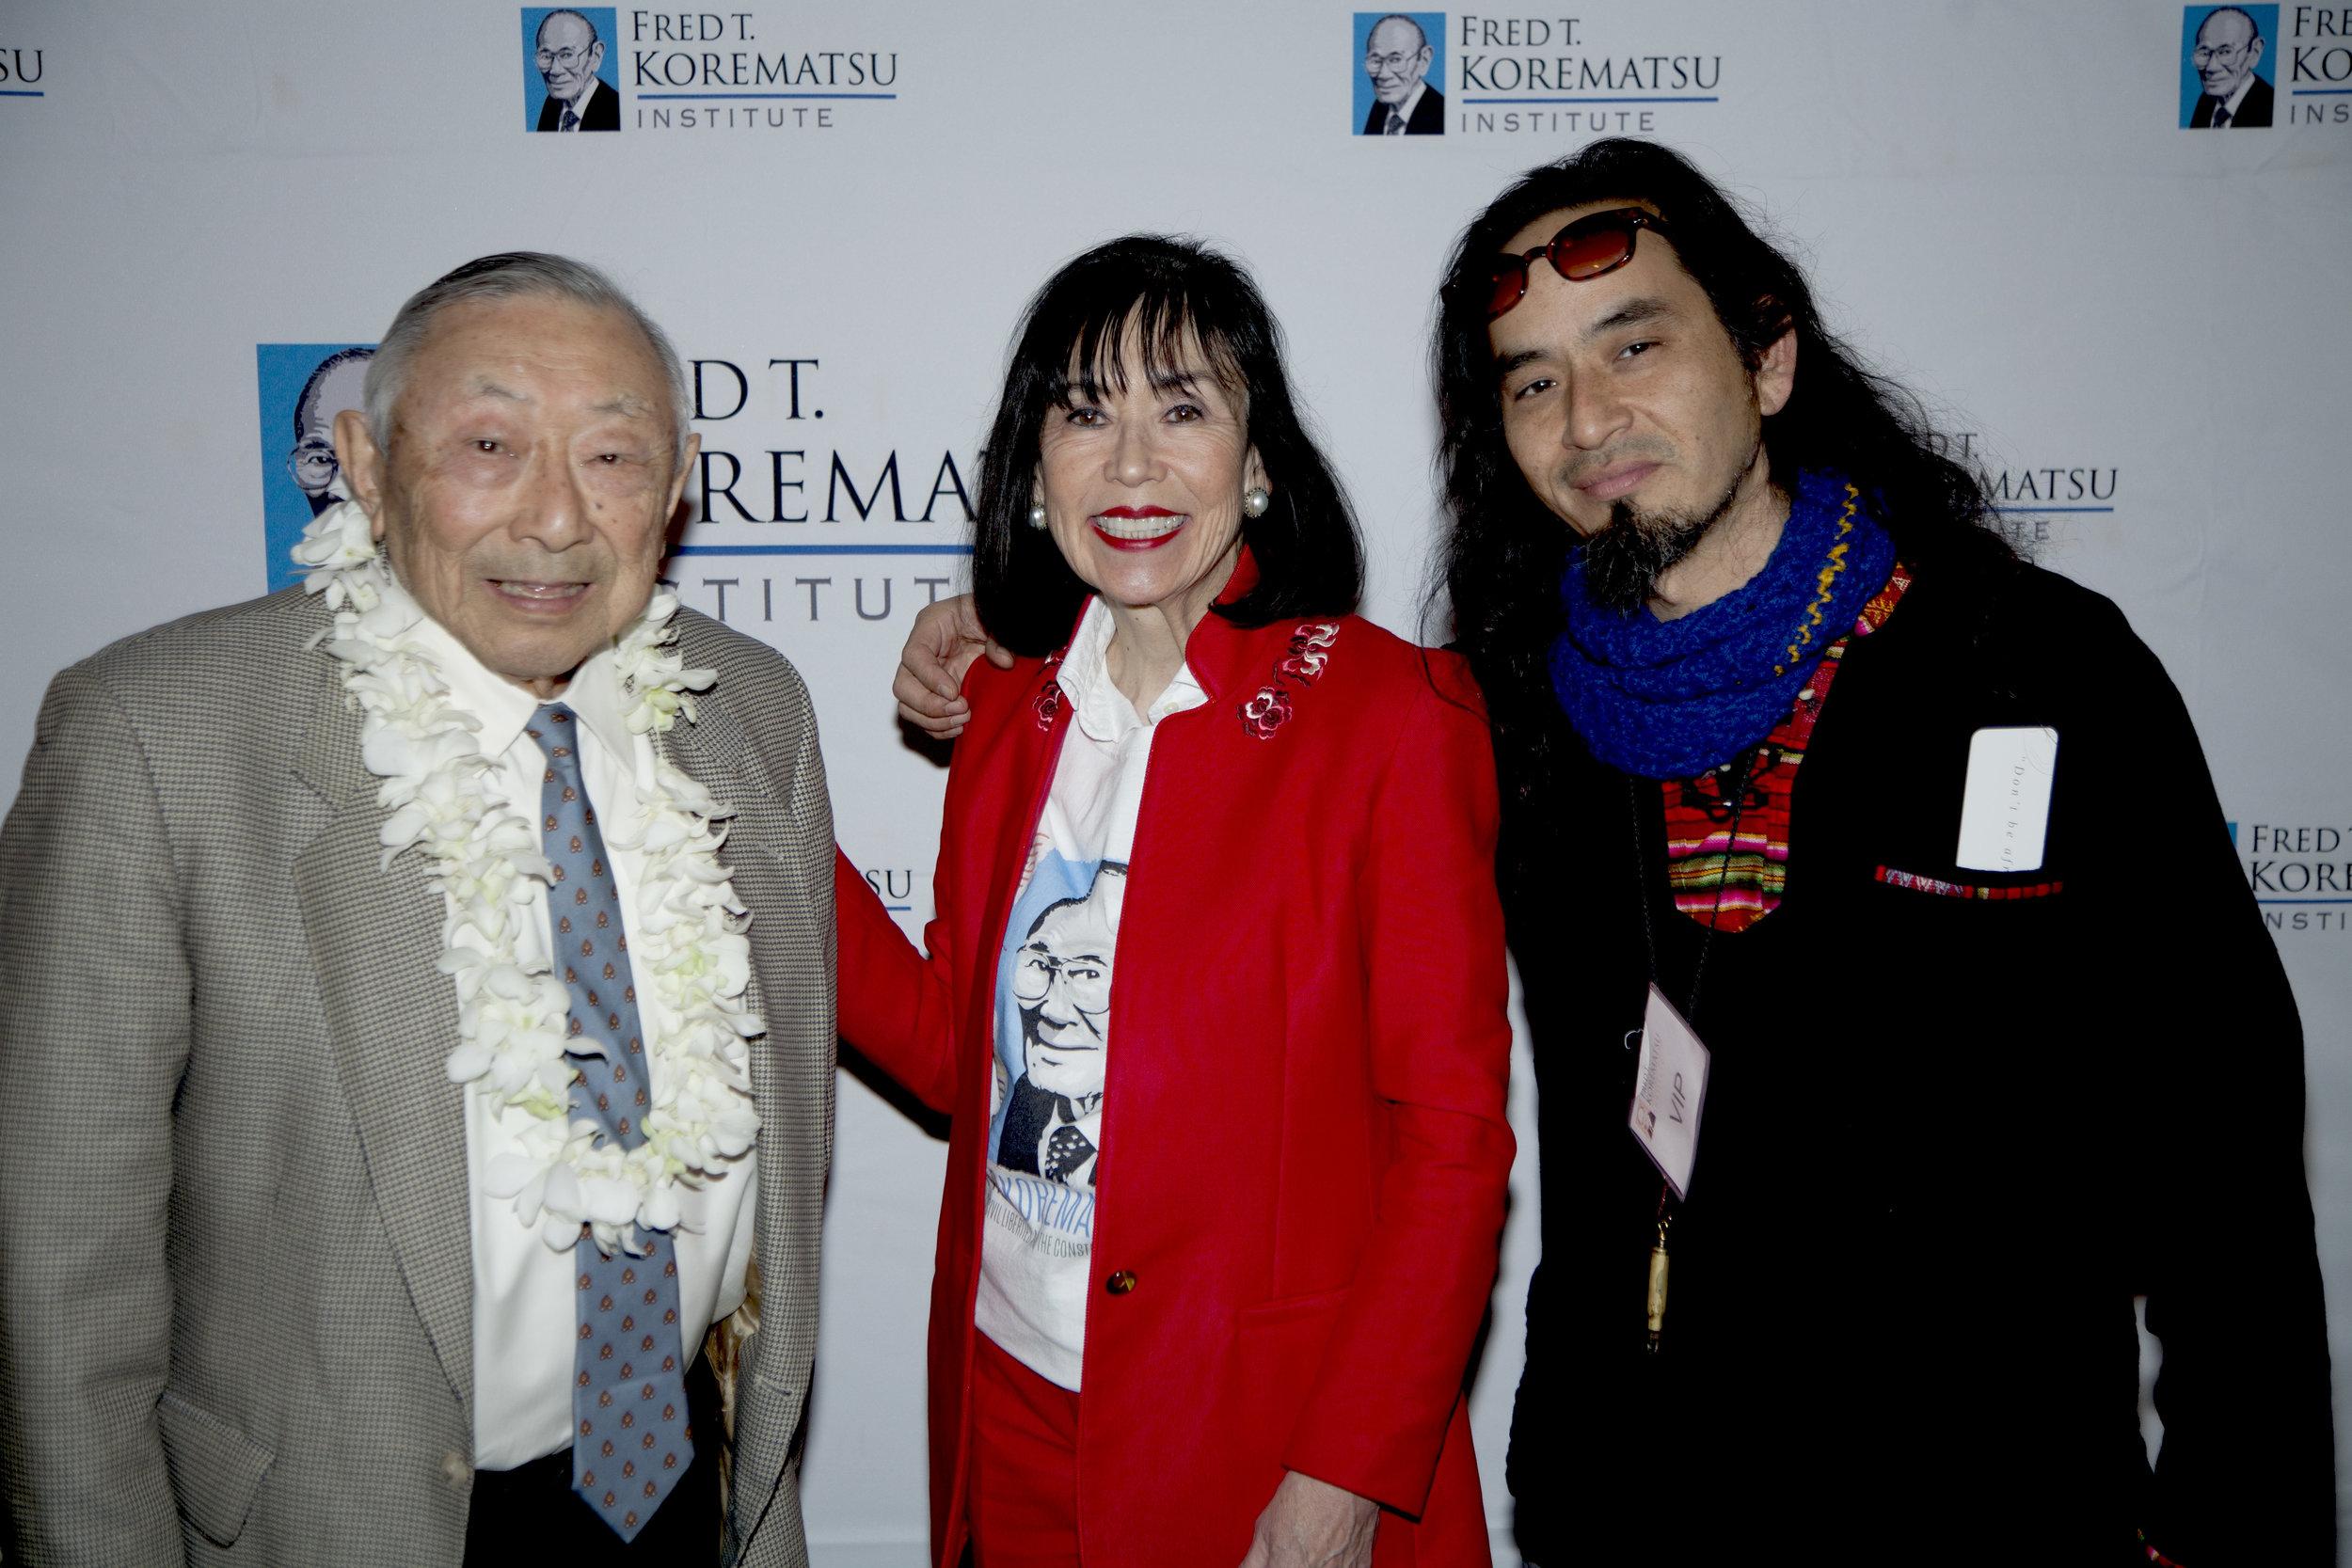 Hiroshi Kashiwagi, Karen Korematsu, and San Francisco hip hop artist and activist Equipto